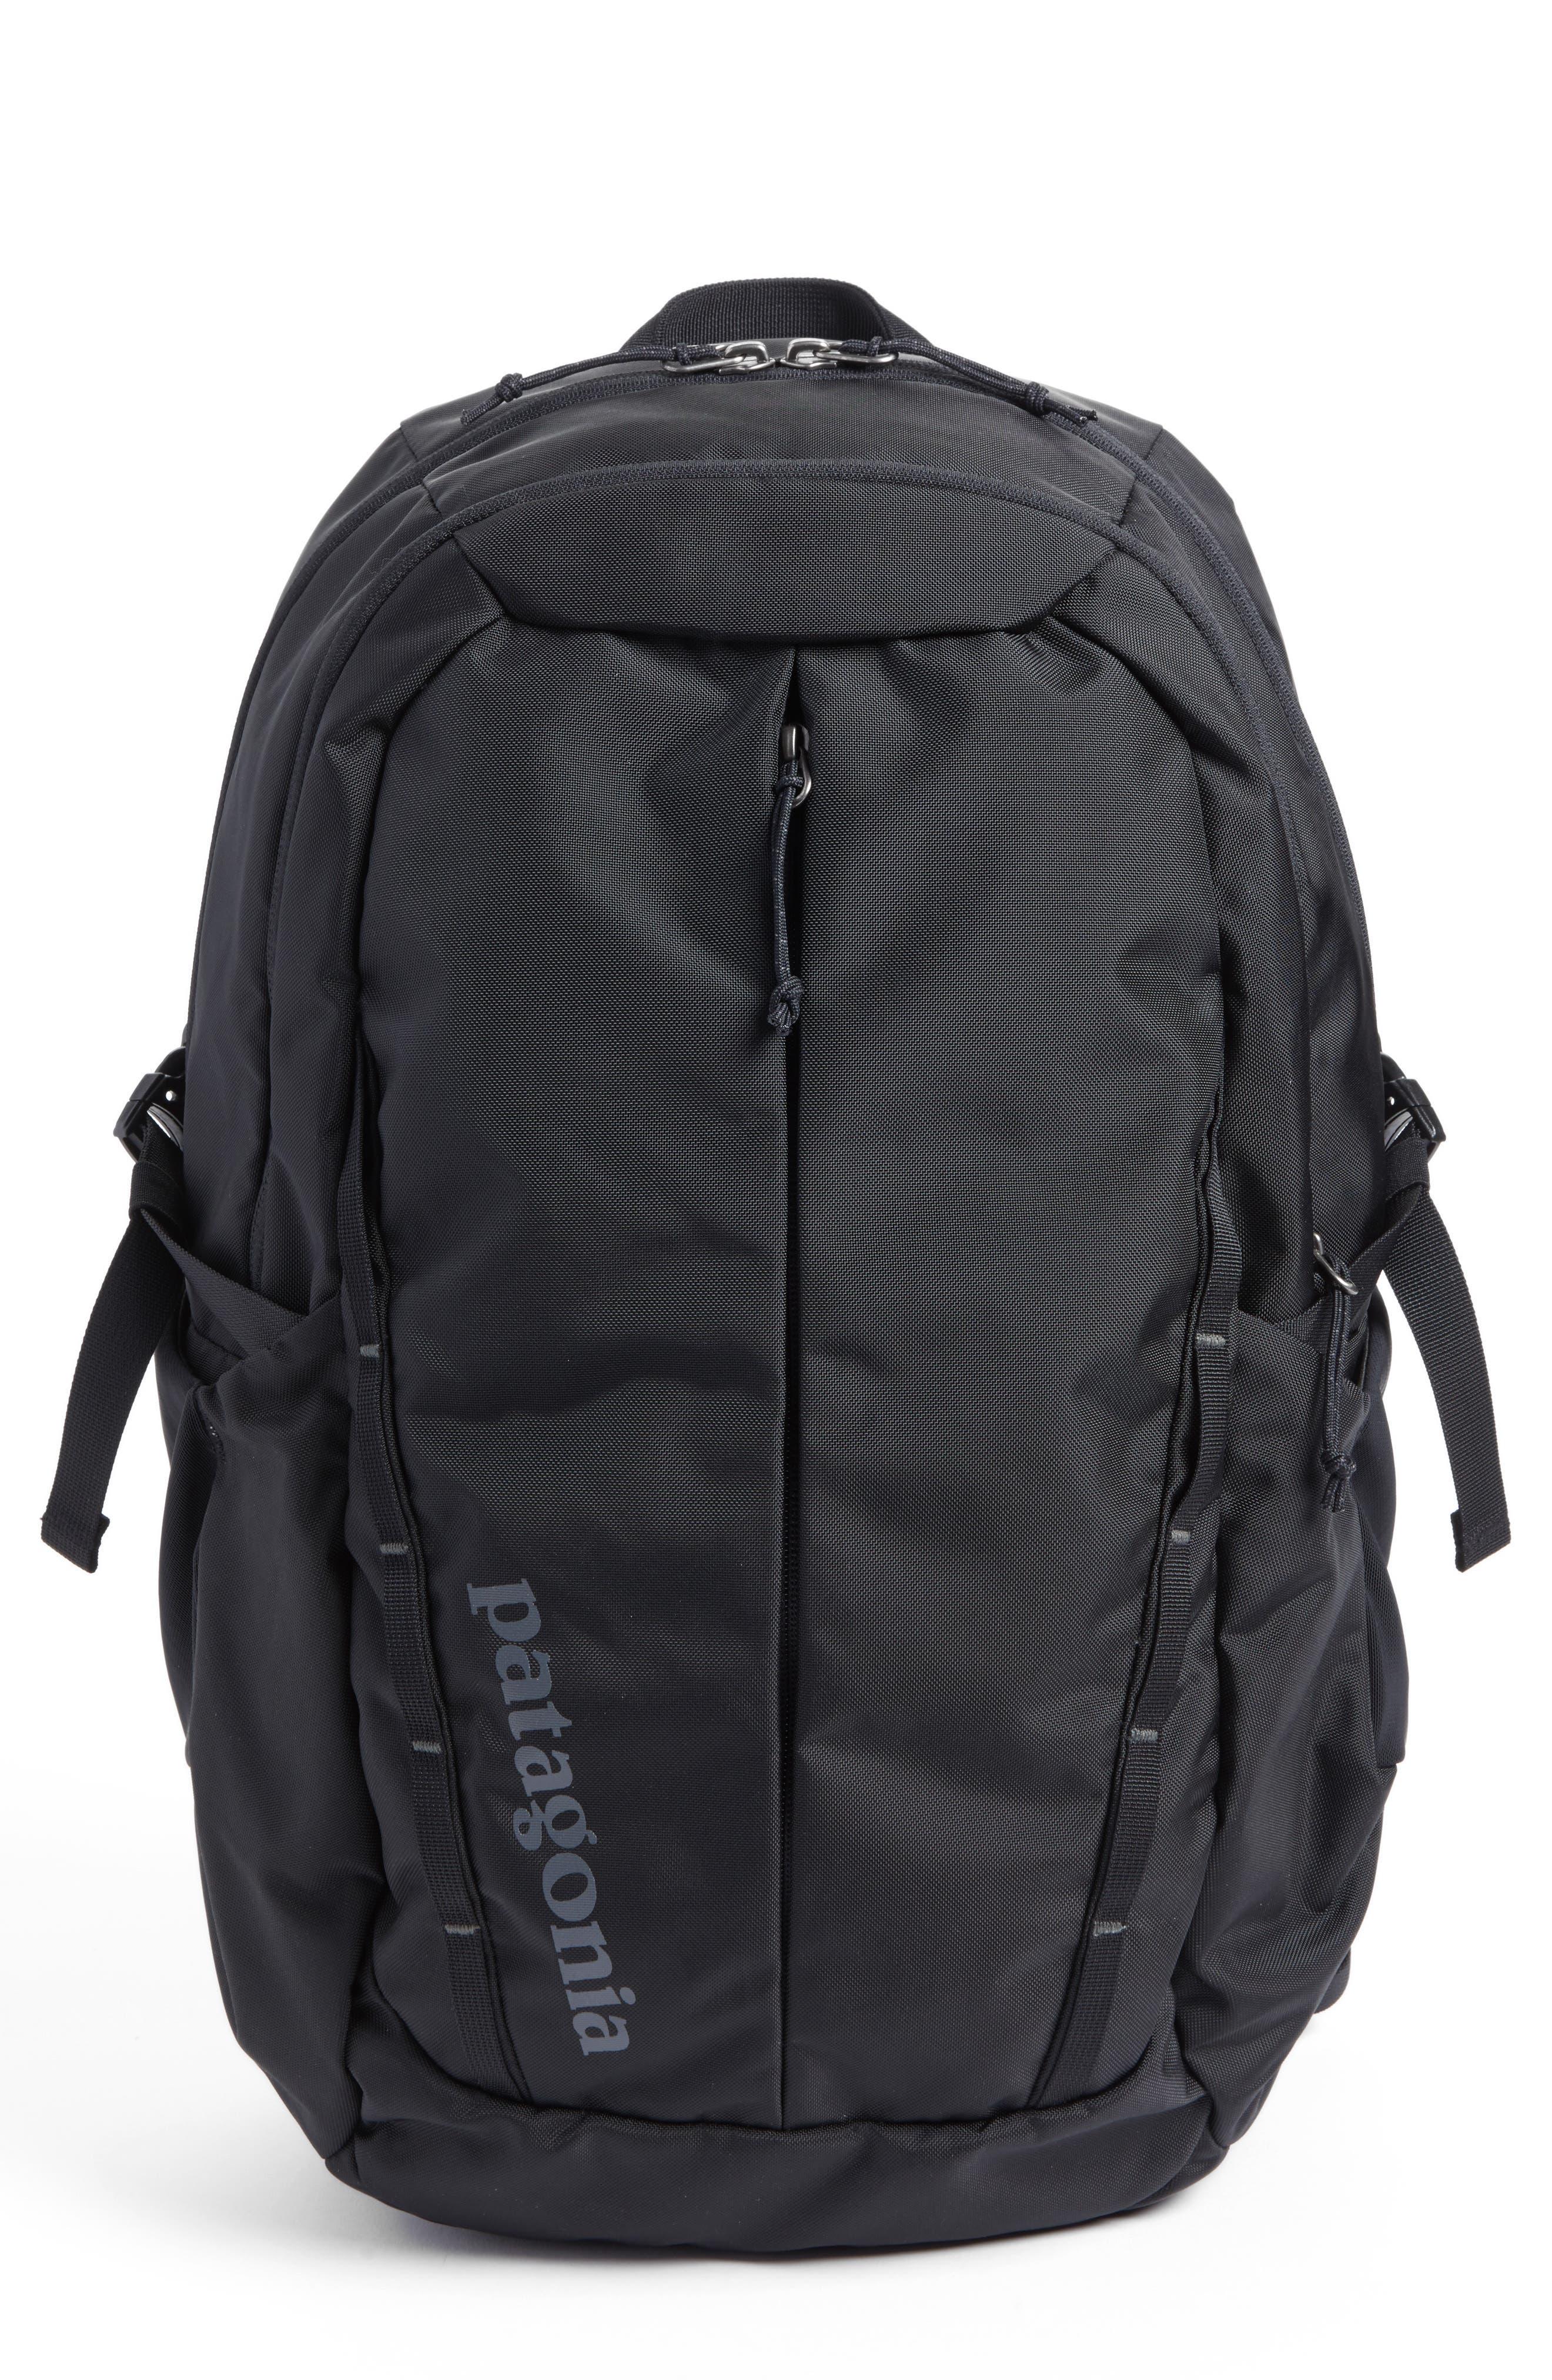 PATAGONIA Refugio 26L Backpack, Main, color, BLACK